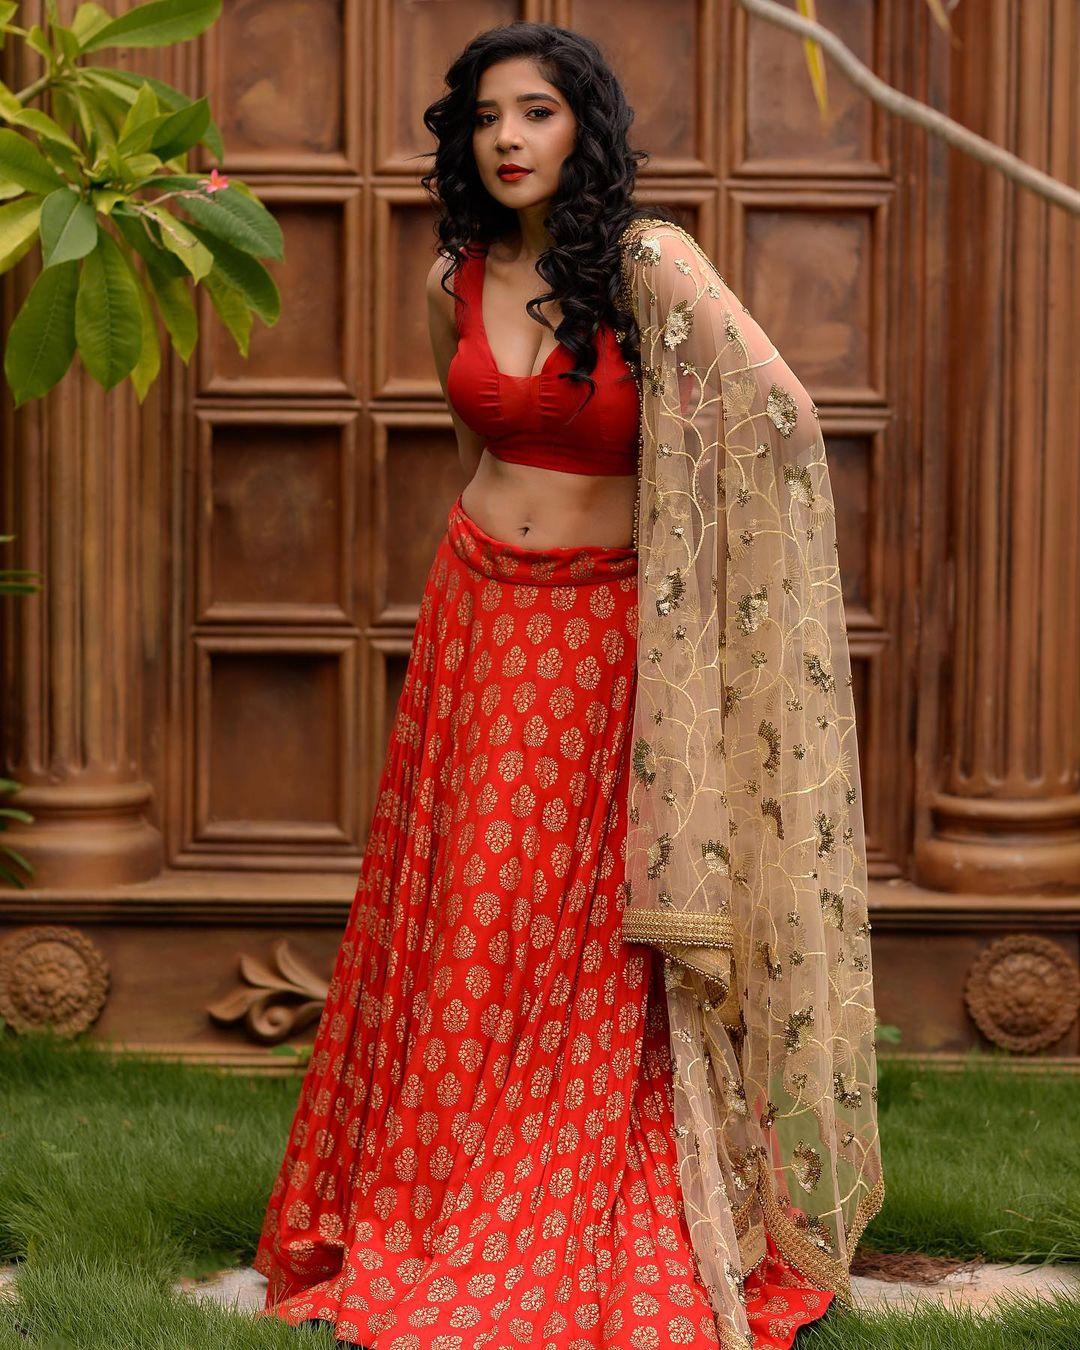 Actress Sakshi Agarwal Latest Hot Navel and Cleavage Show in Half Saree - actressbuzz.com